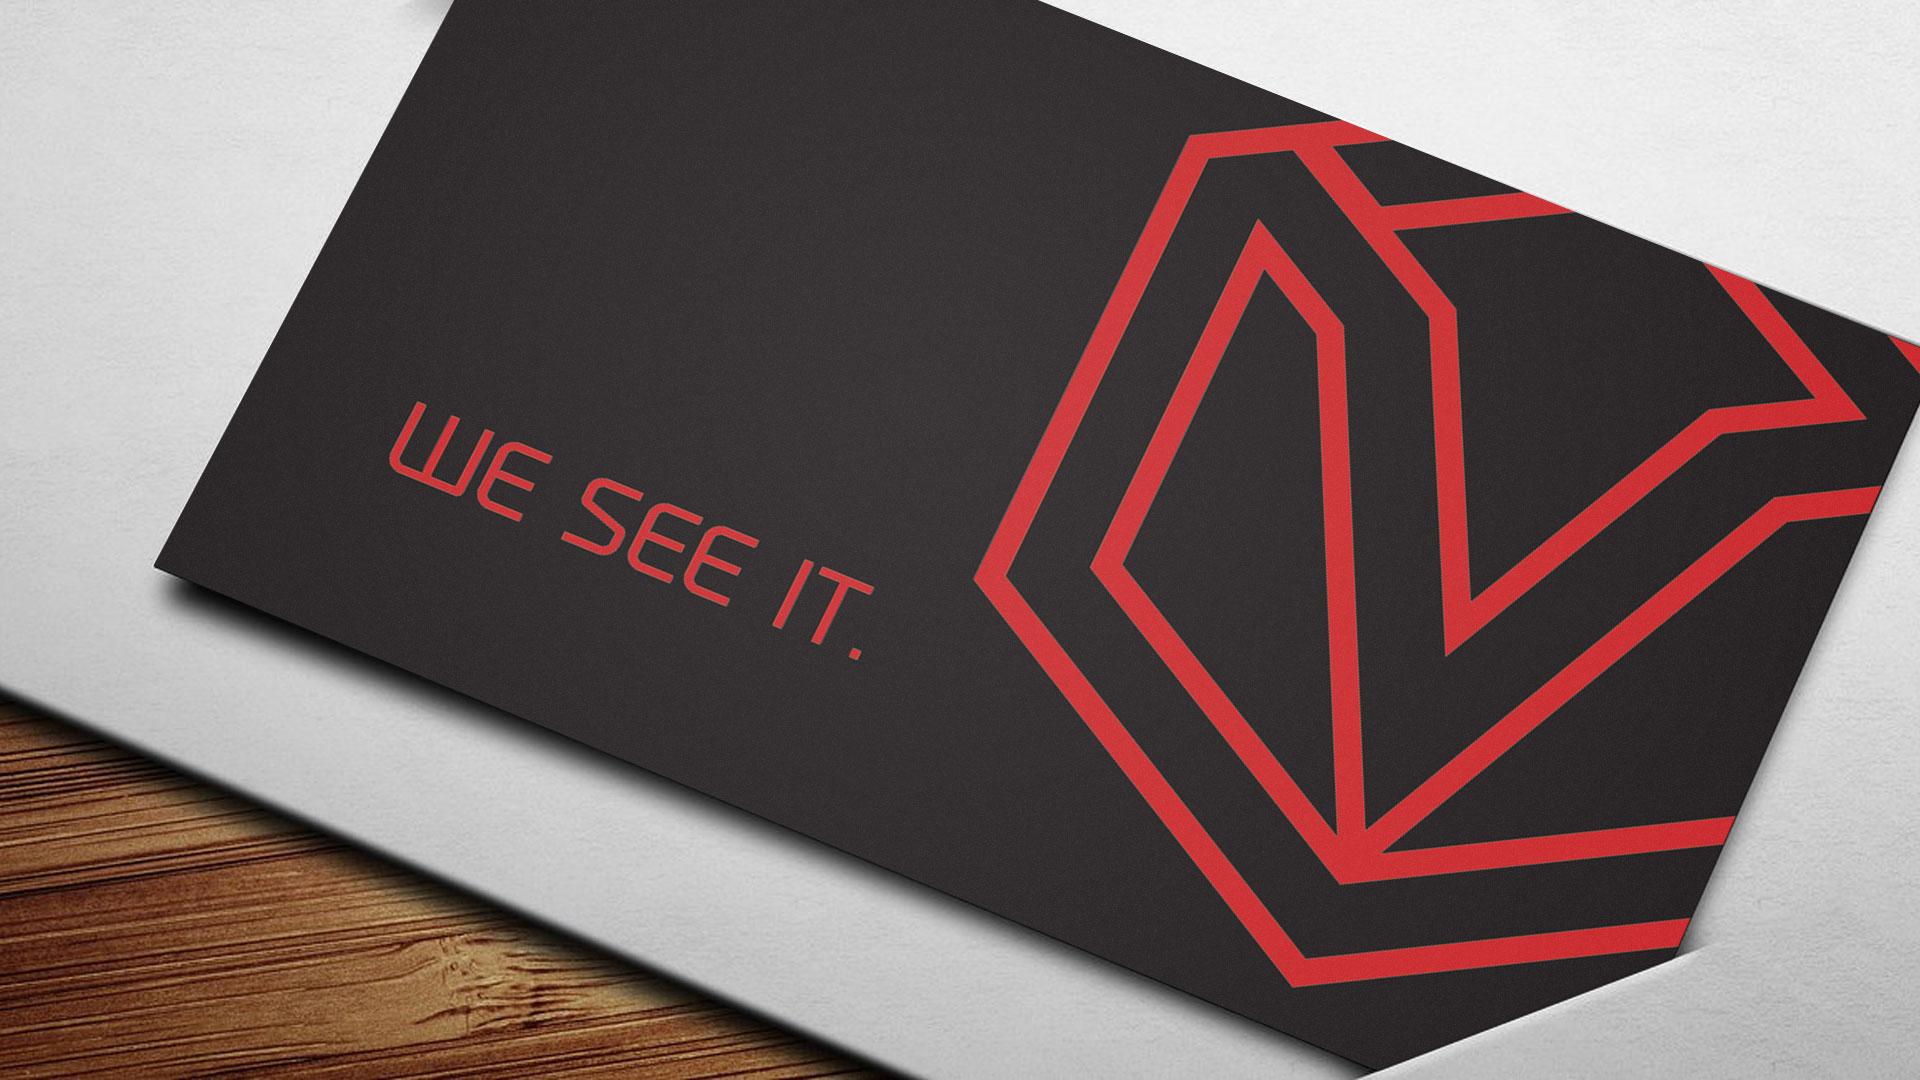 Voore-Design-Business-Card.jpg